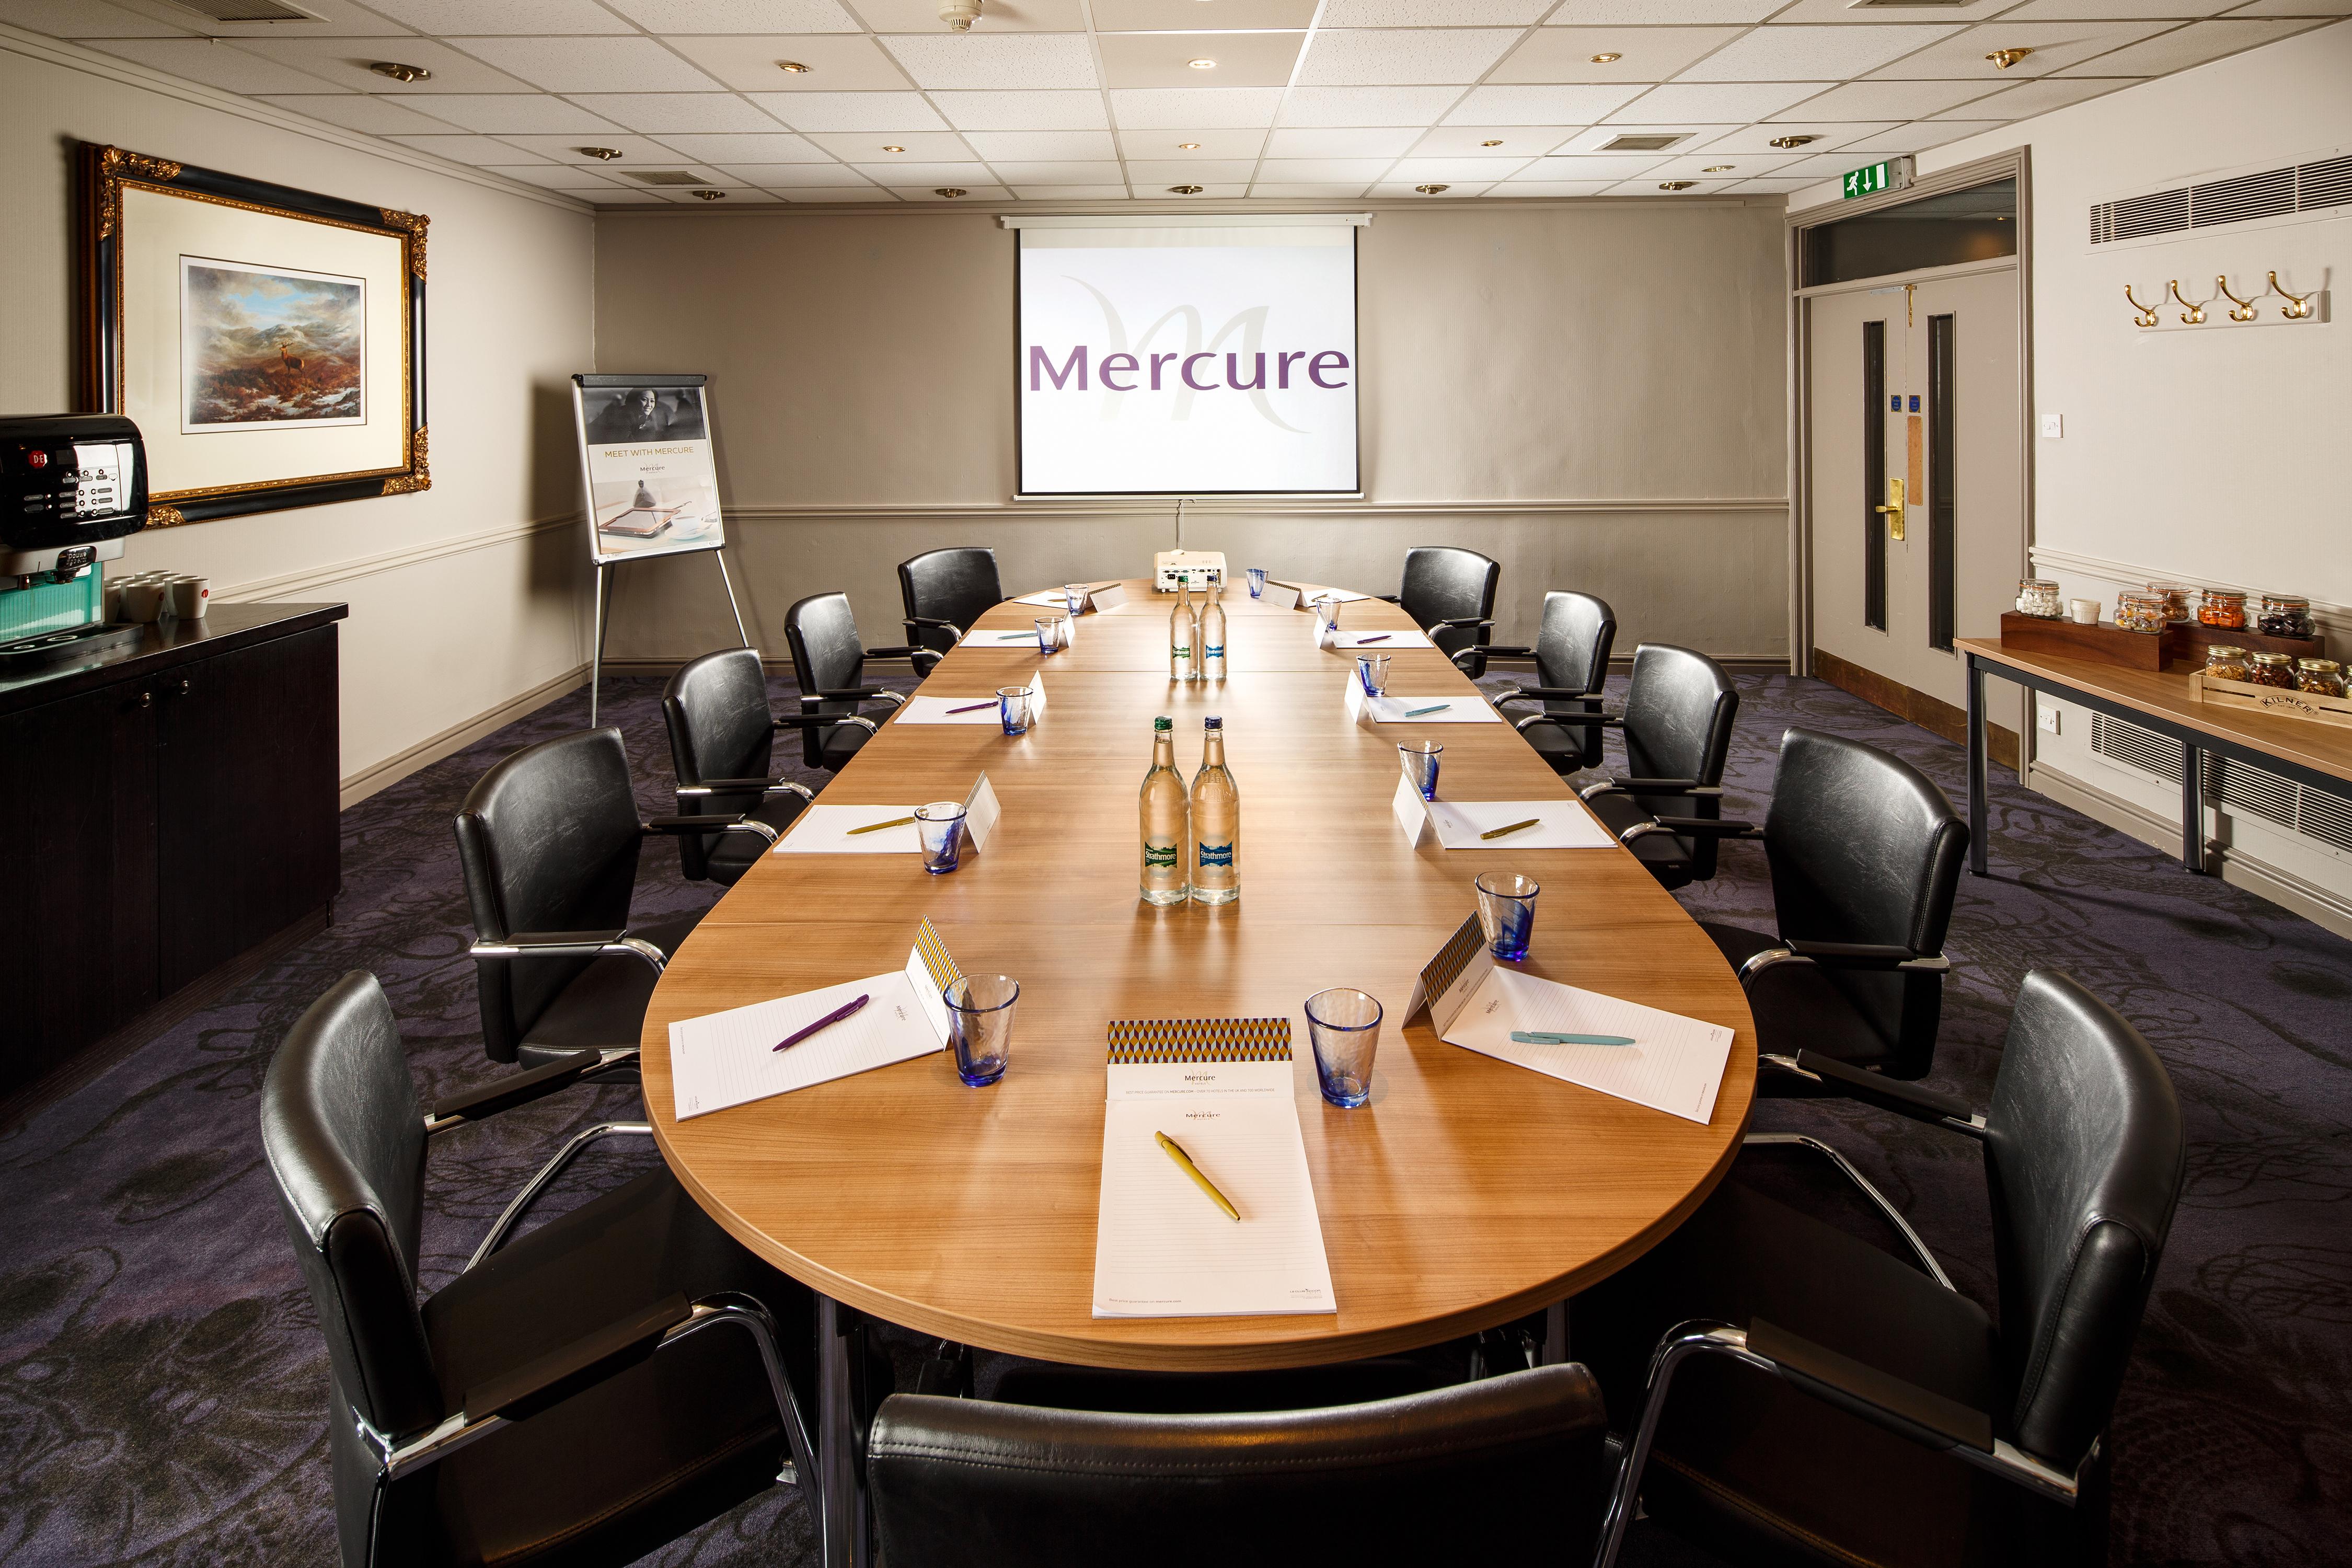 mercure_inverness_hotel